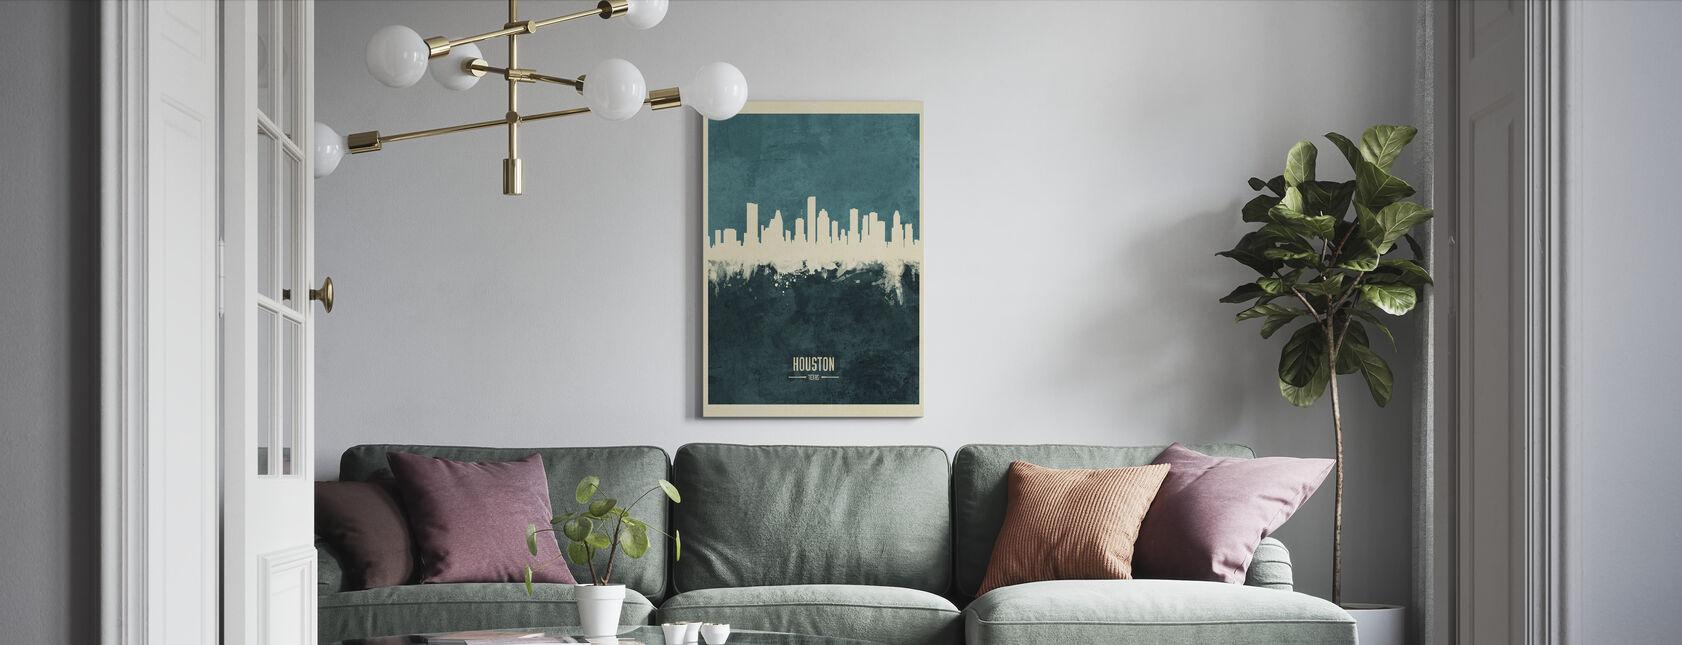 Houston Texas Skyline Blauw - Canvas print - Woonkamer